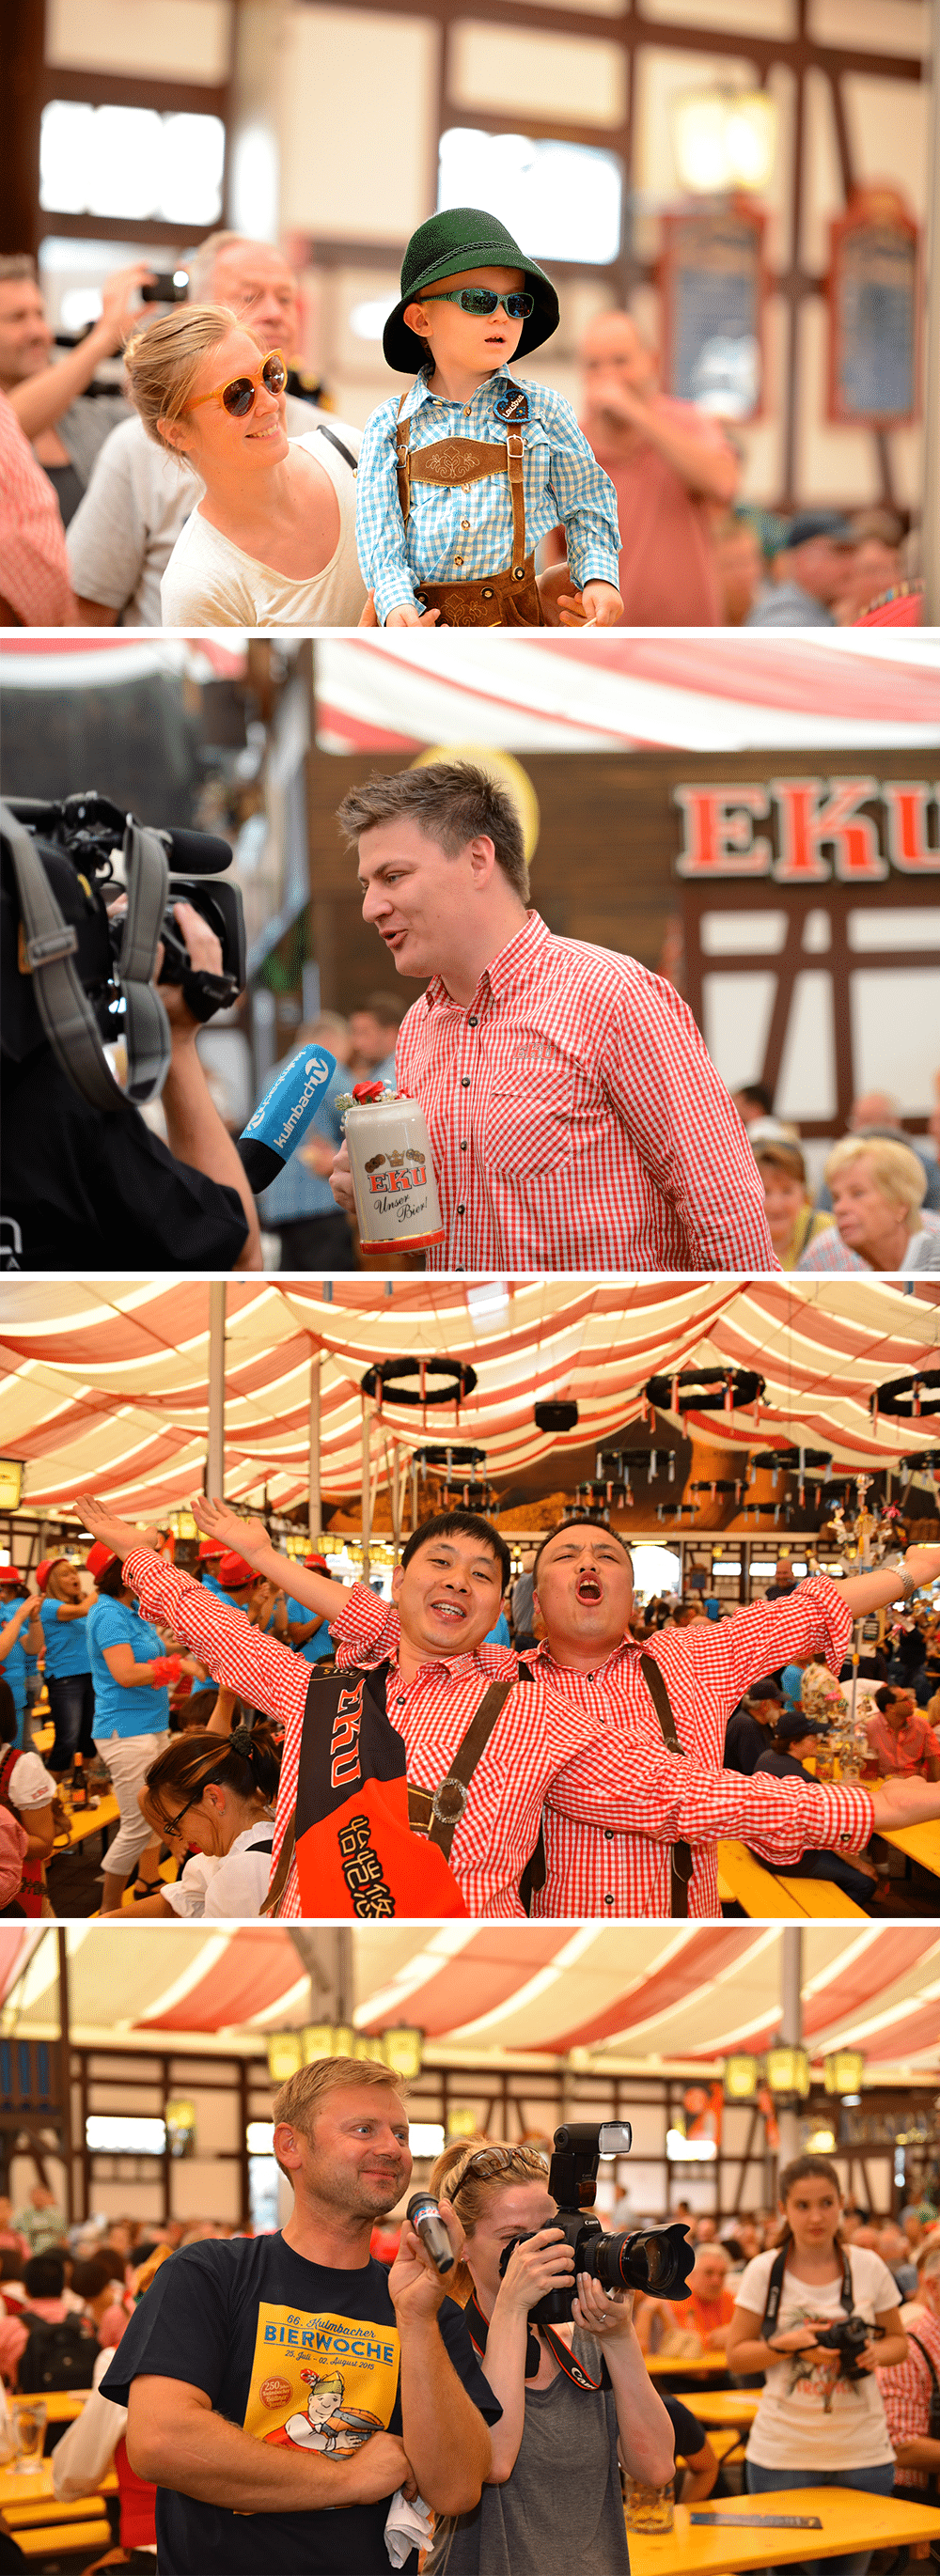 kulmbacher-bierfest-gäste-aus-amerika-china-chris-heinze-herbert-georgius-moderation